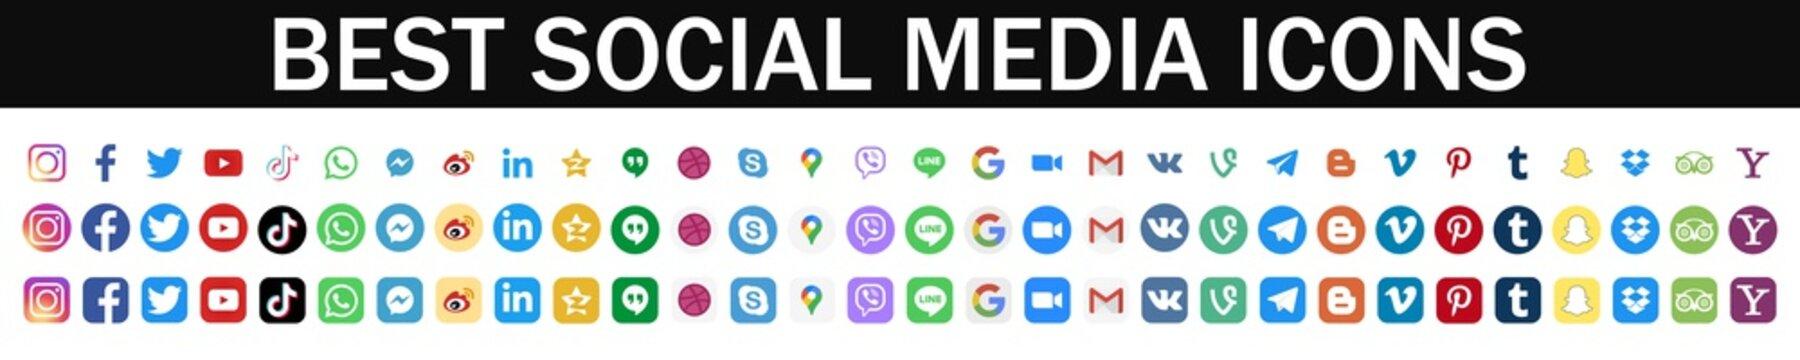 Instagram, Facebook, Twitter, Whatsapp, TikTok, Youtube, Viber etc - popular social media, messengers, video platform, internet services. Google applications symbols. Kyiv, Ukraine - January 31, 2021